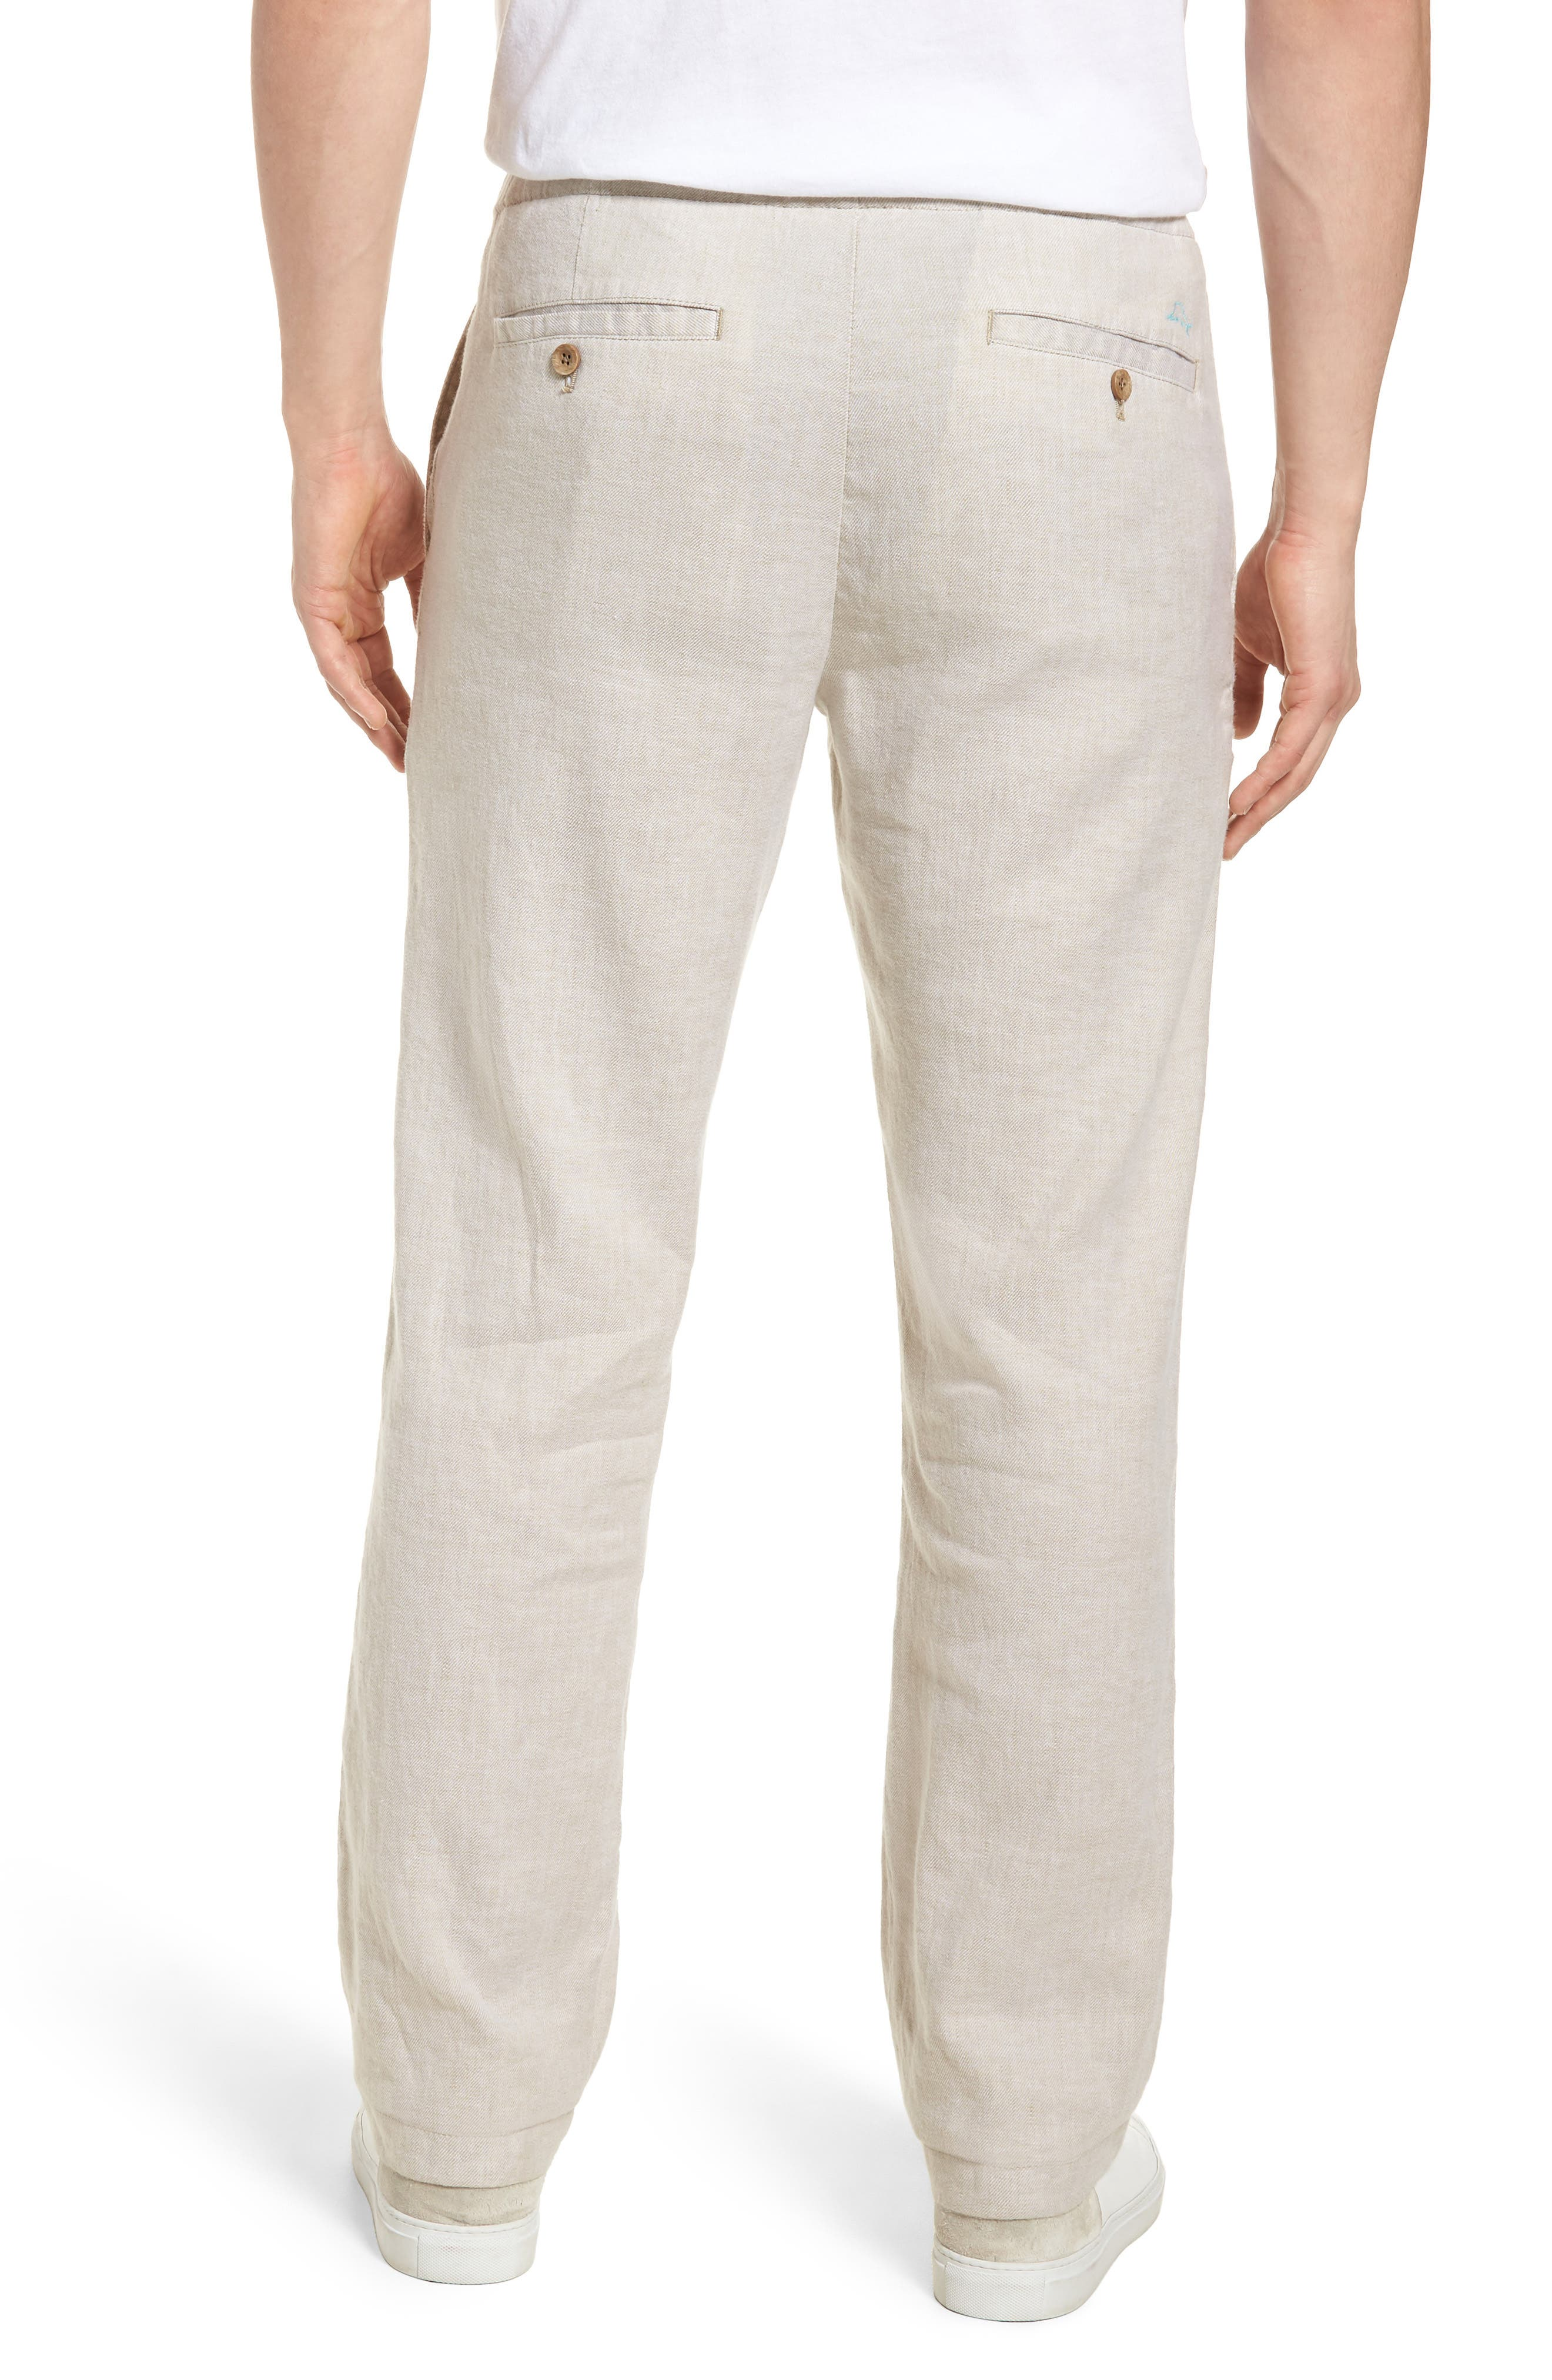 Beach Linen Blend Pants,                             Alternate thumbnail 2, color,                             Stone Khaki